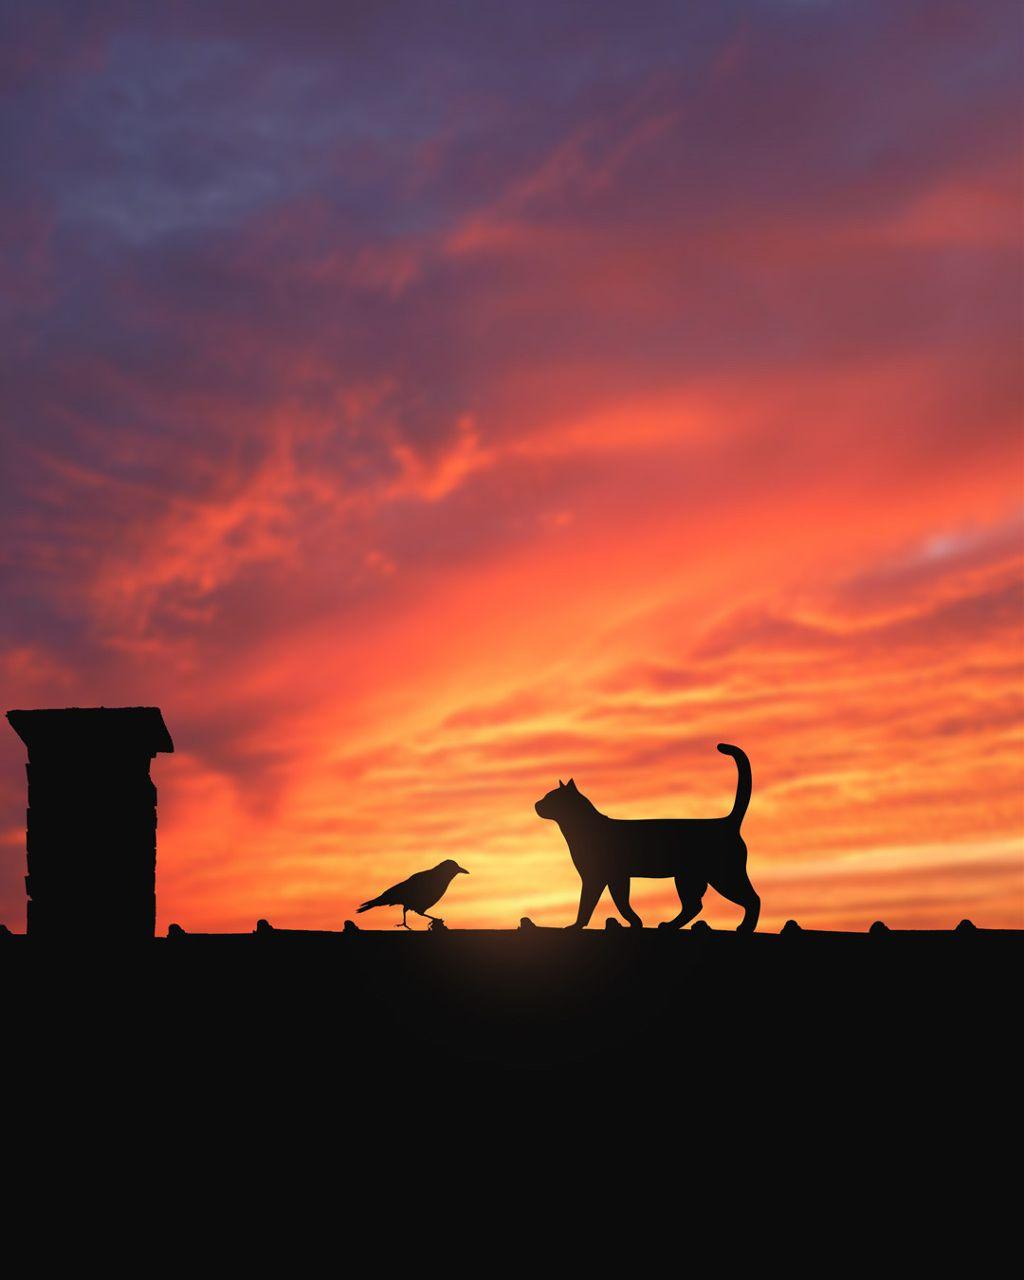 Making friends #freetoedit #sunset #colorful #cat